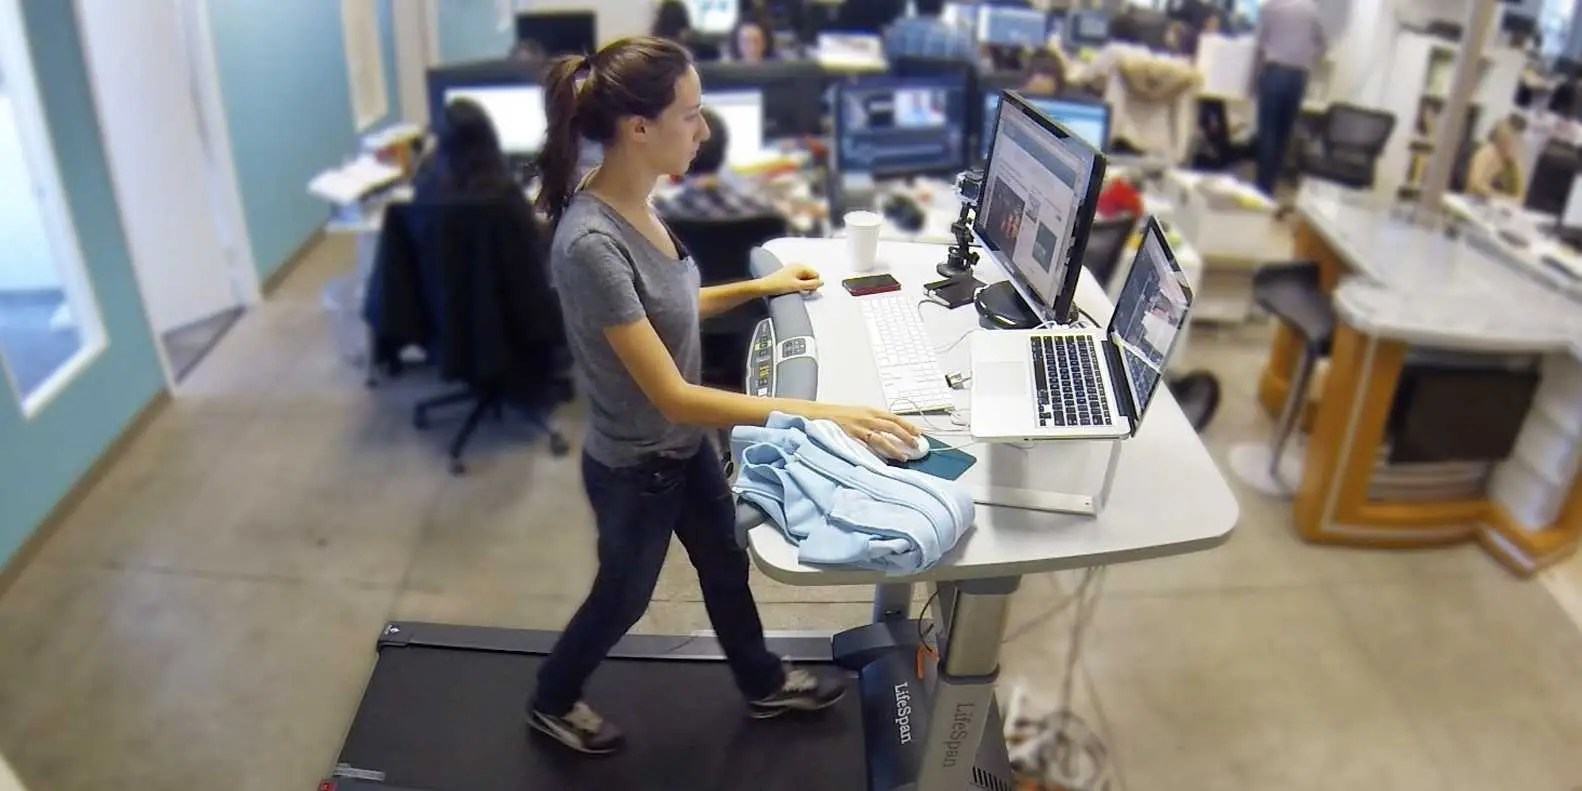 julie zeveloff treadmill desk gopro